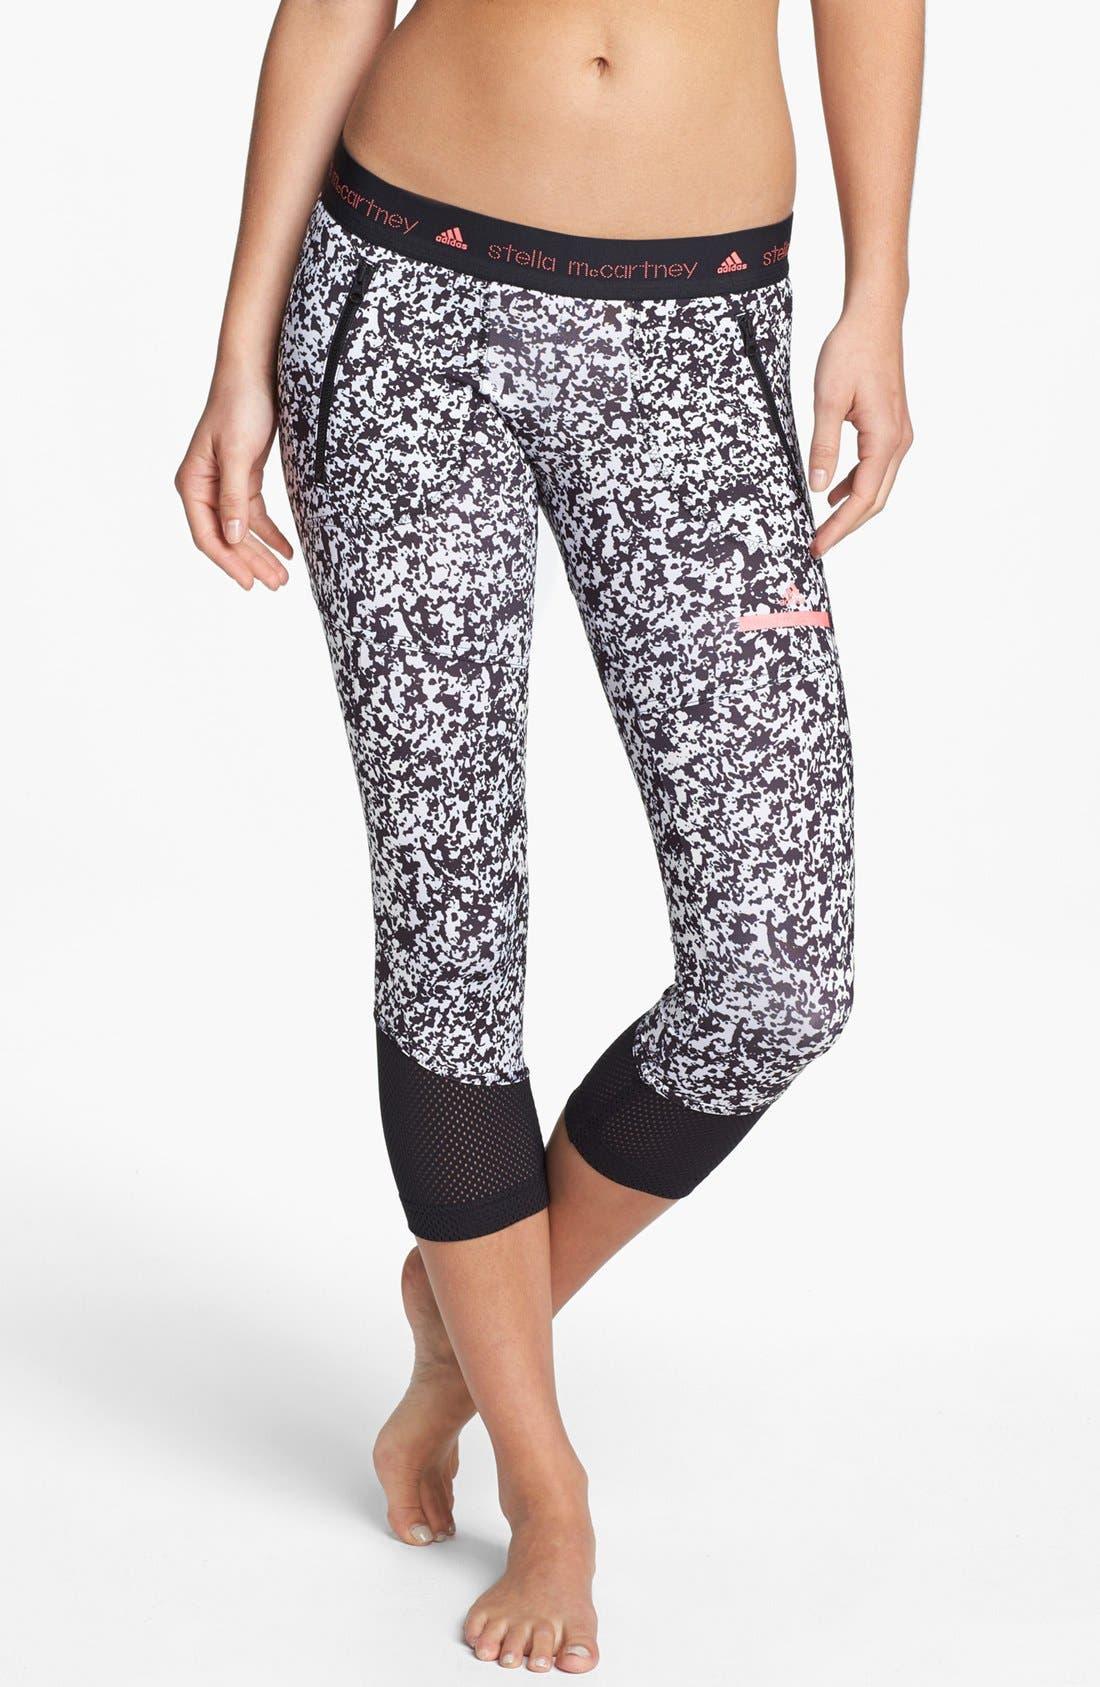 Main Image - adidas by Stella McCartney 'Run' Three Quarter Length Pants